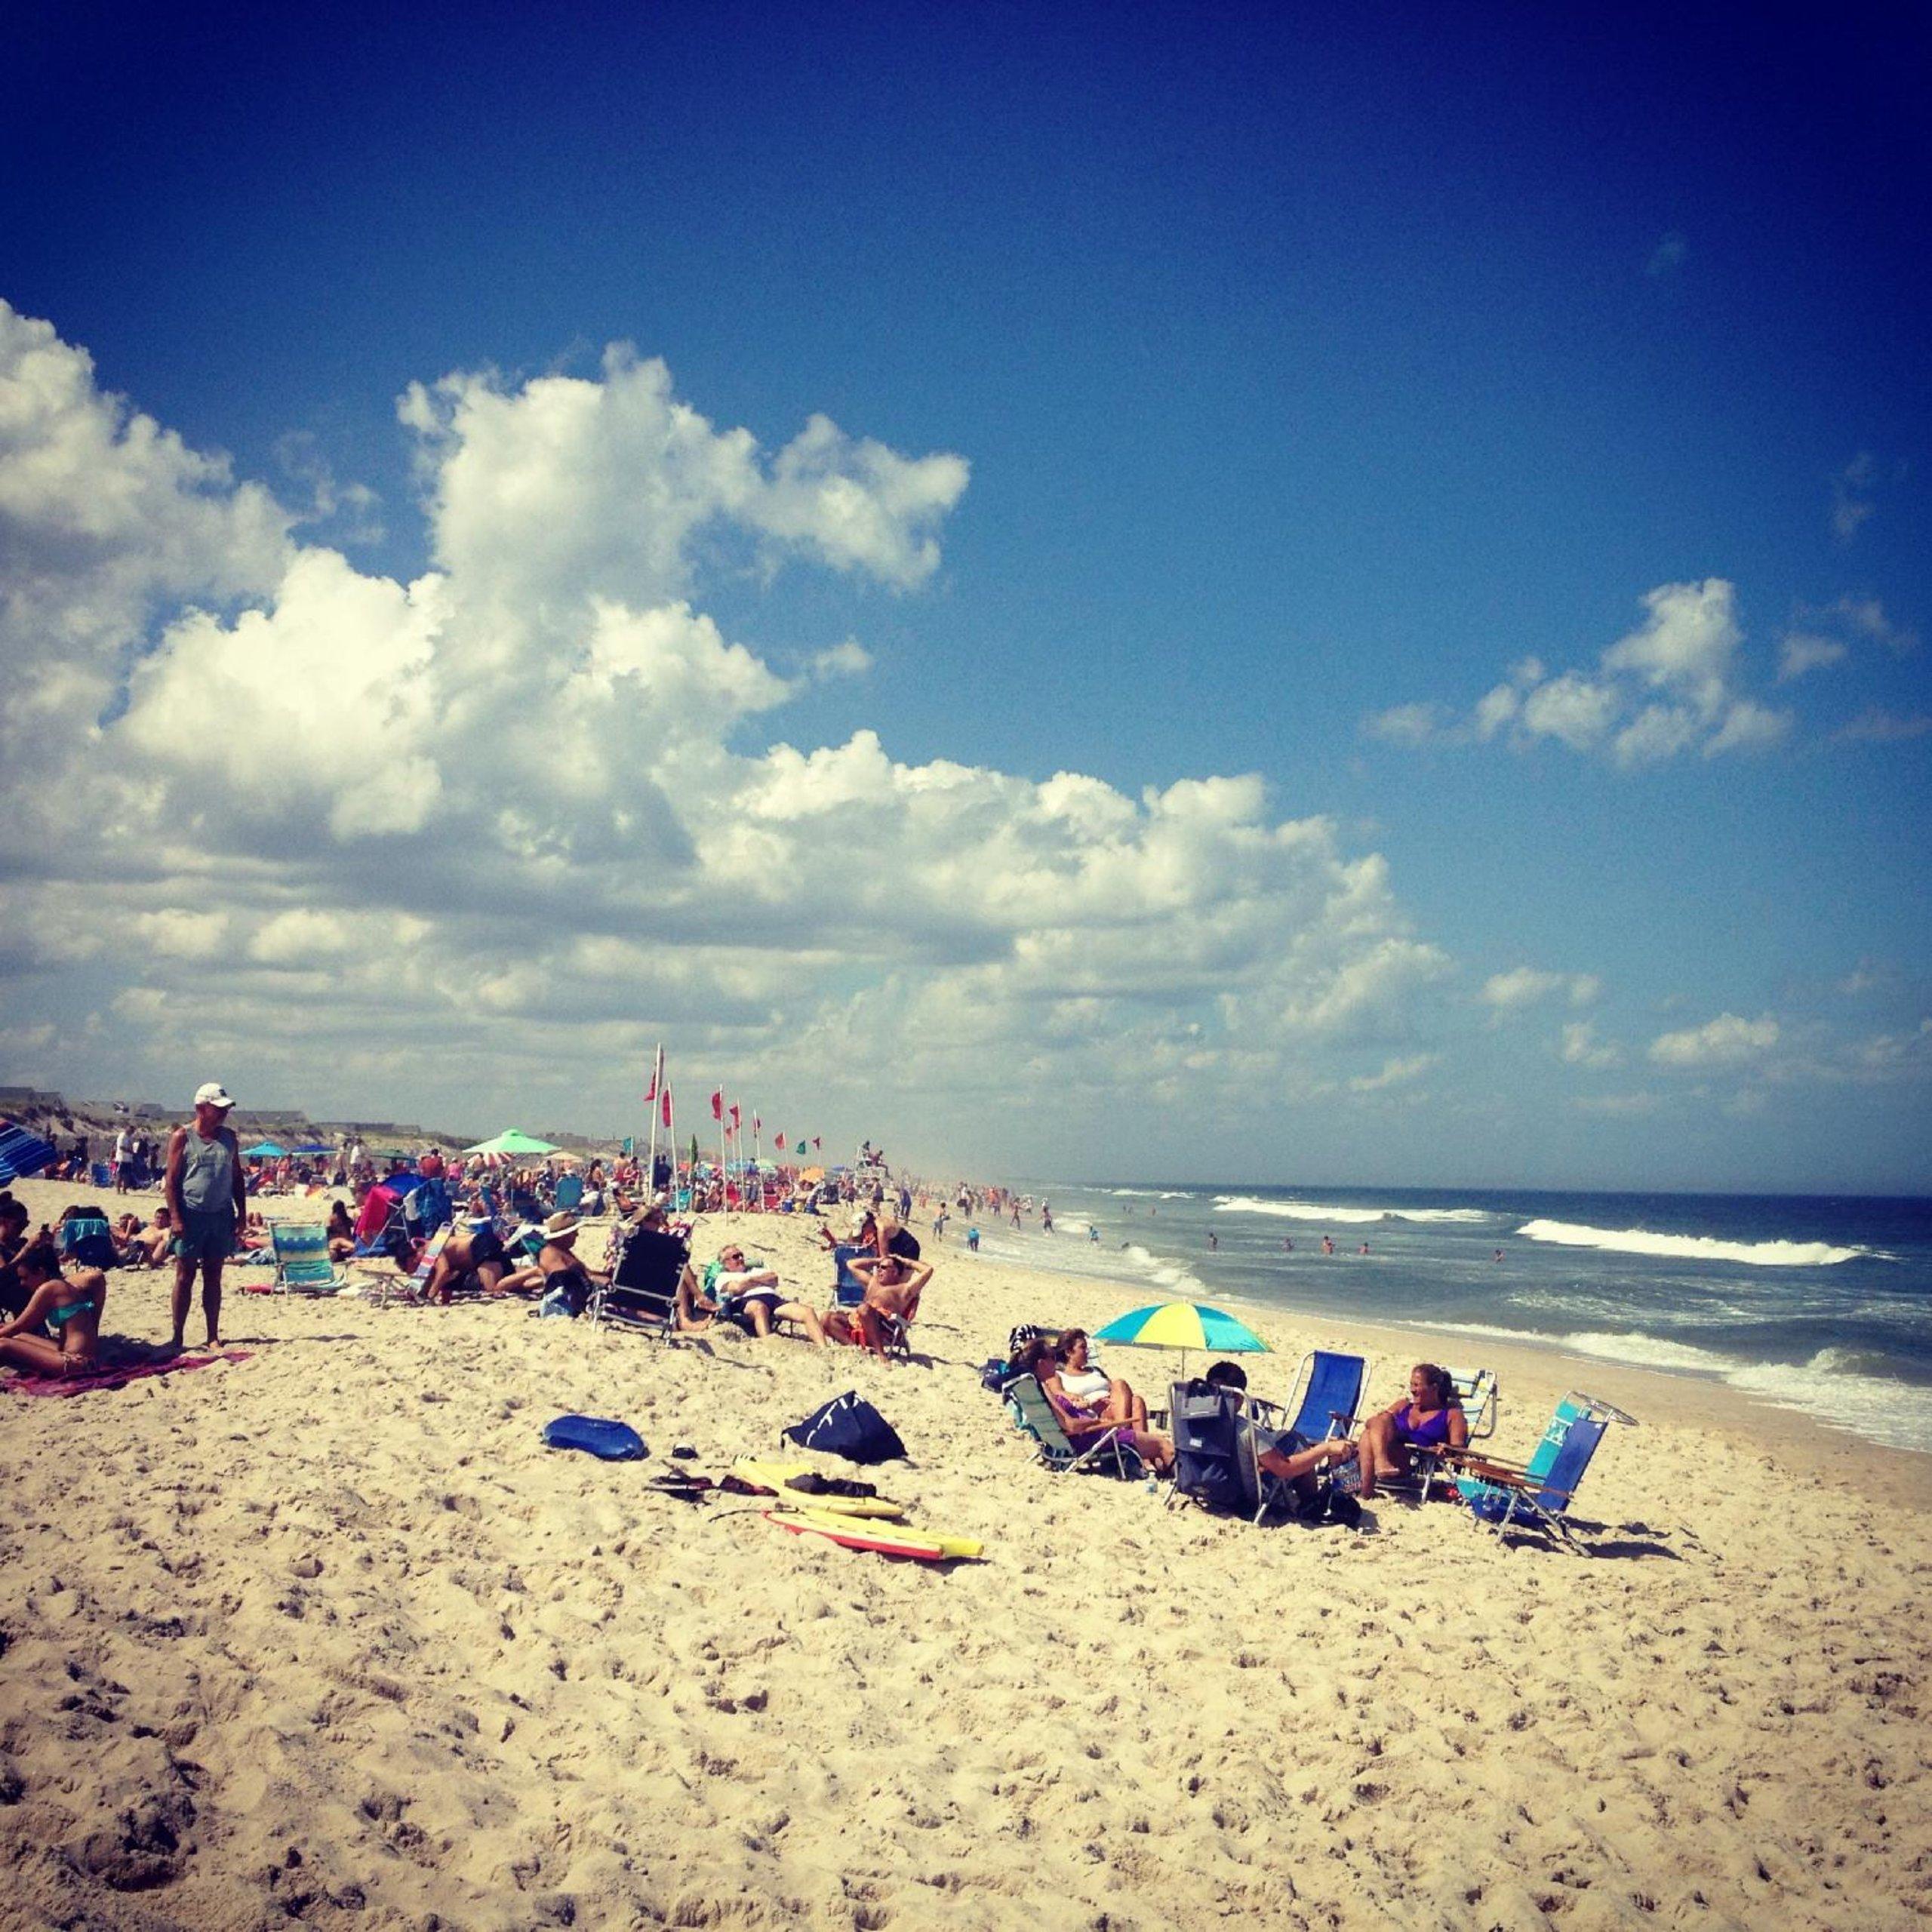 Seaside Park Beach 2020 All You Need